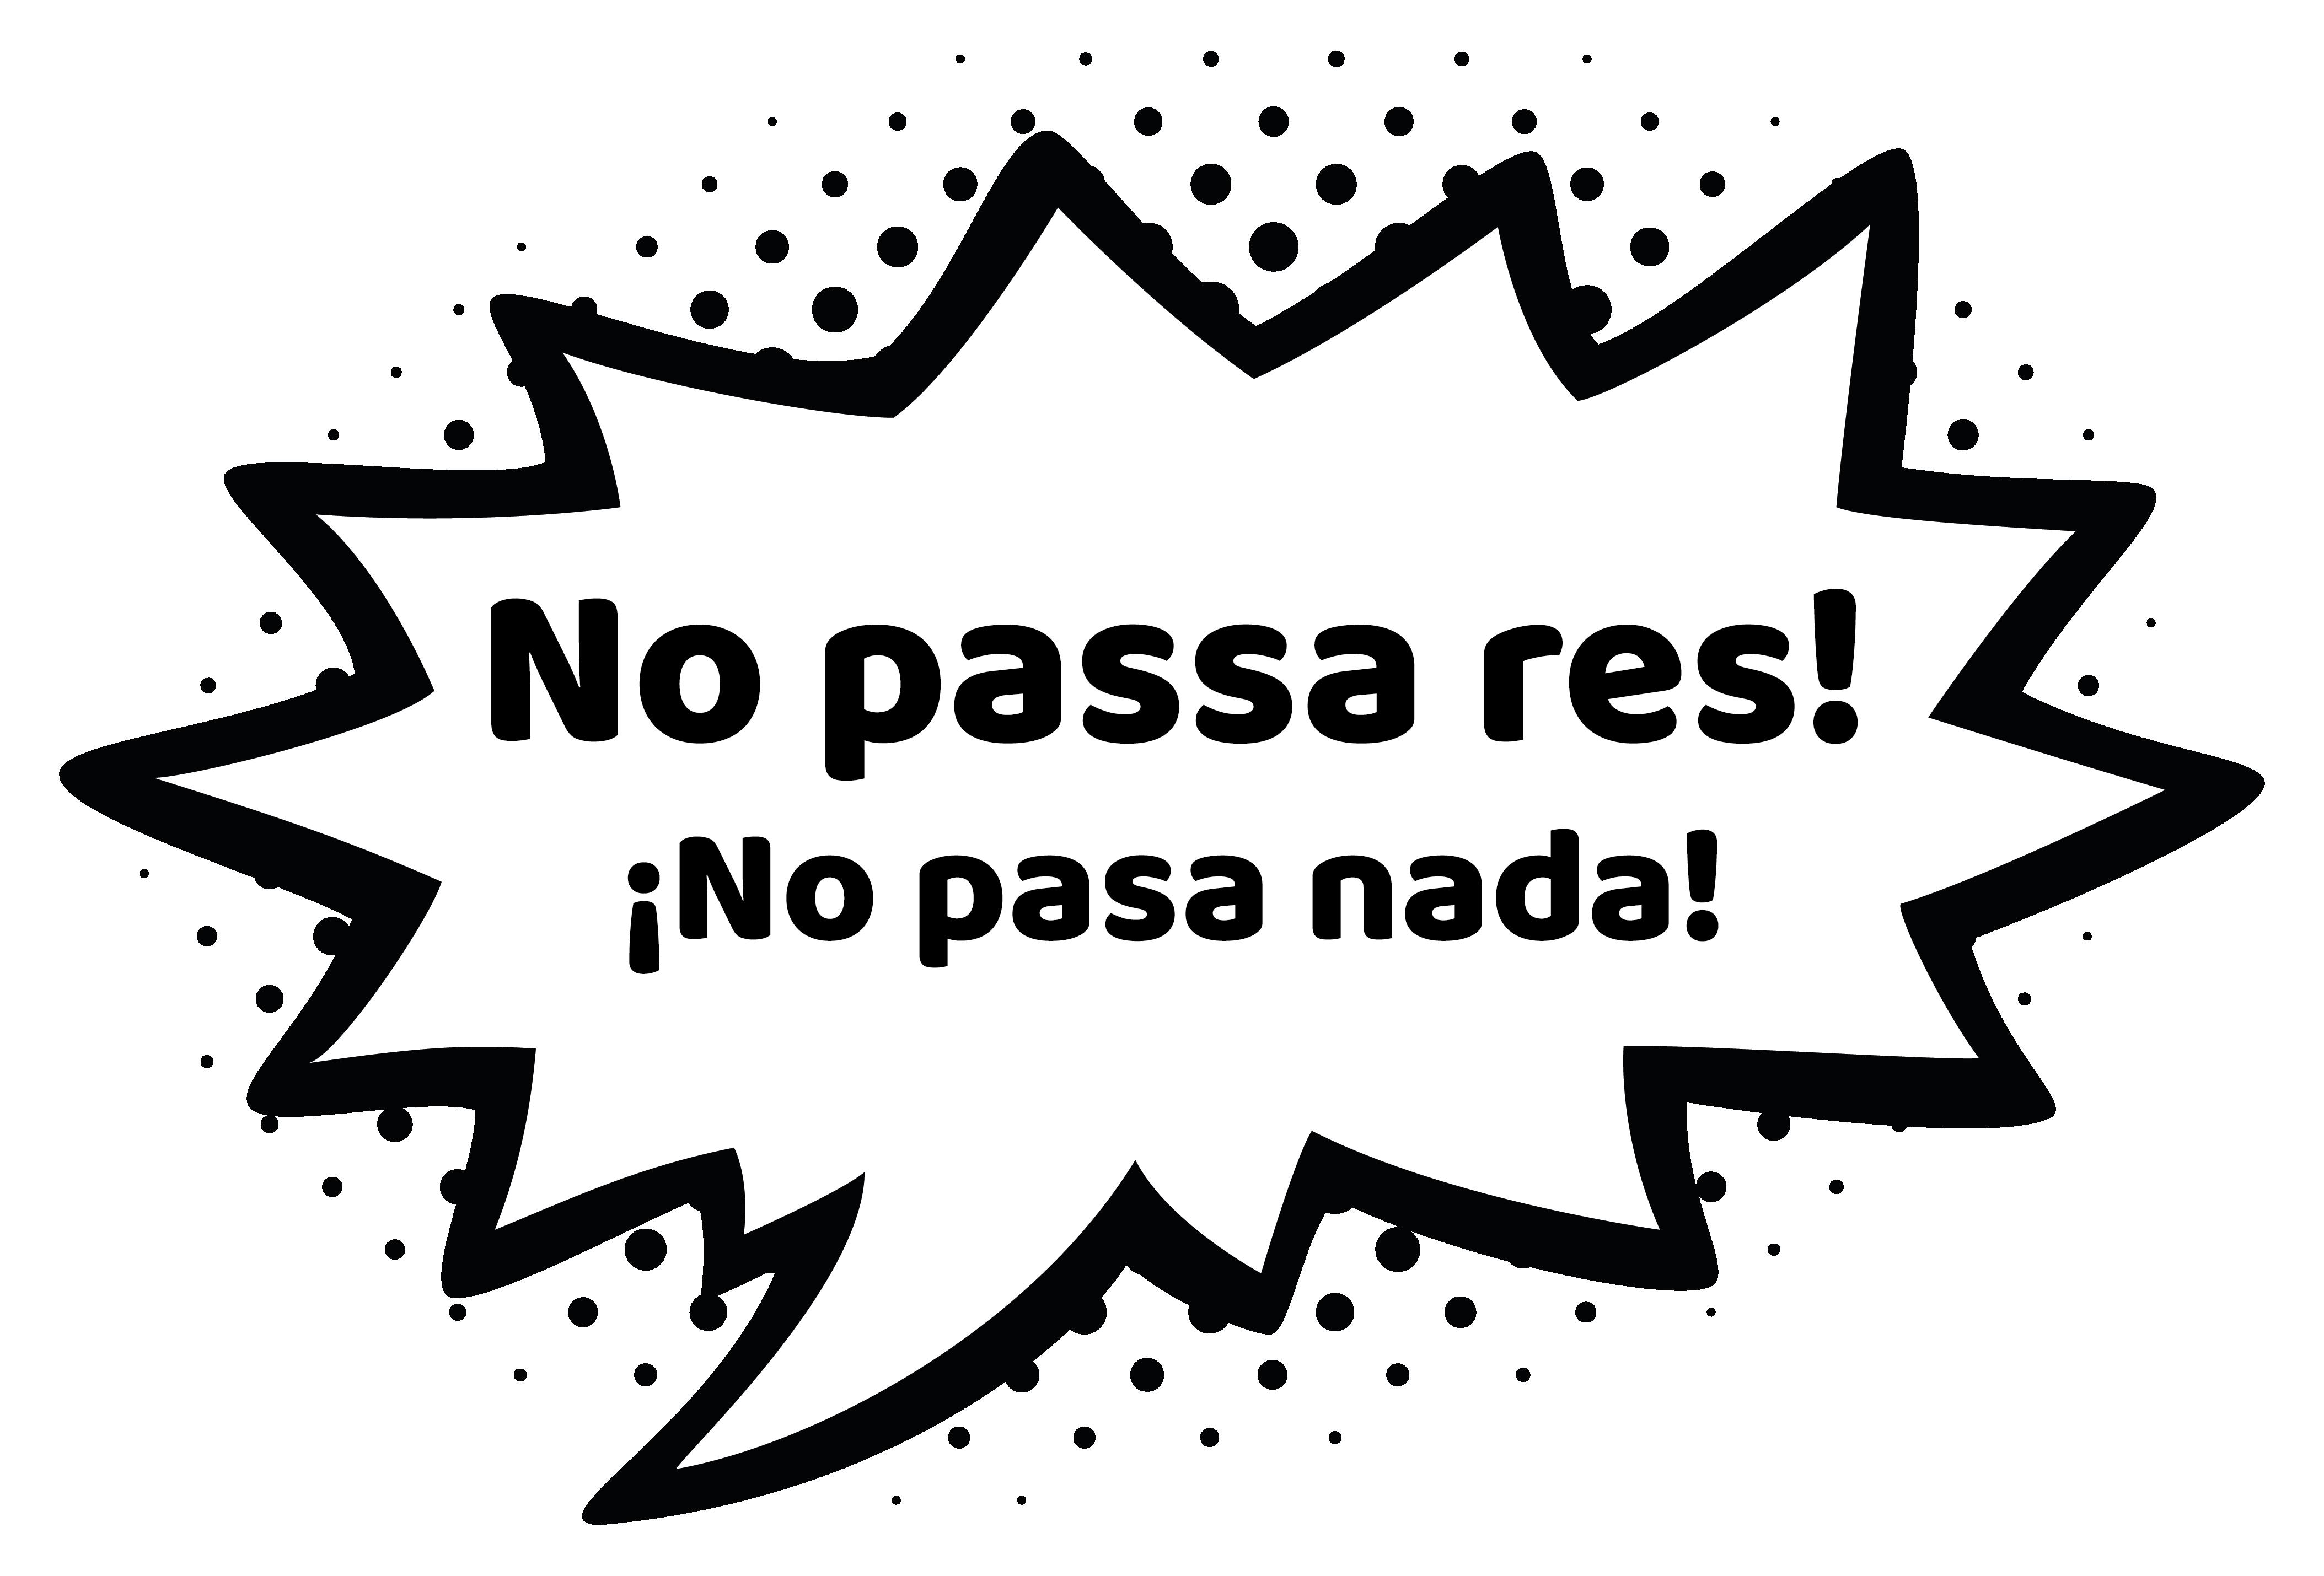 nopassares-04